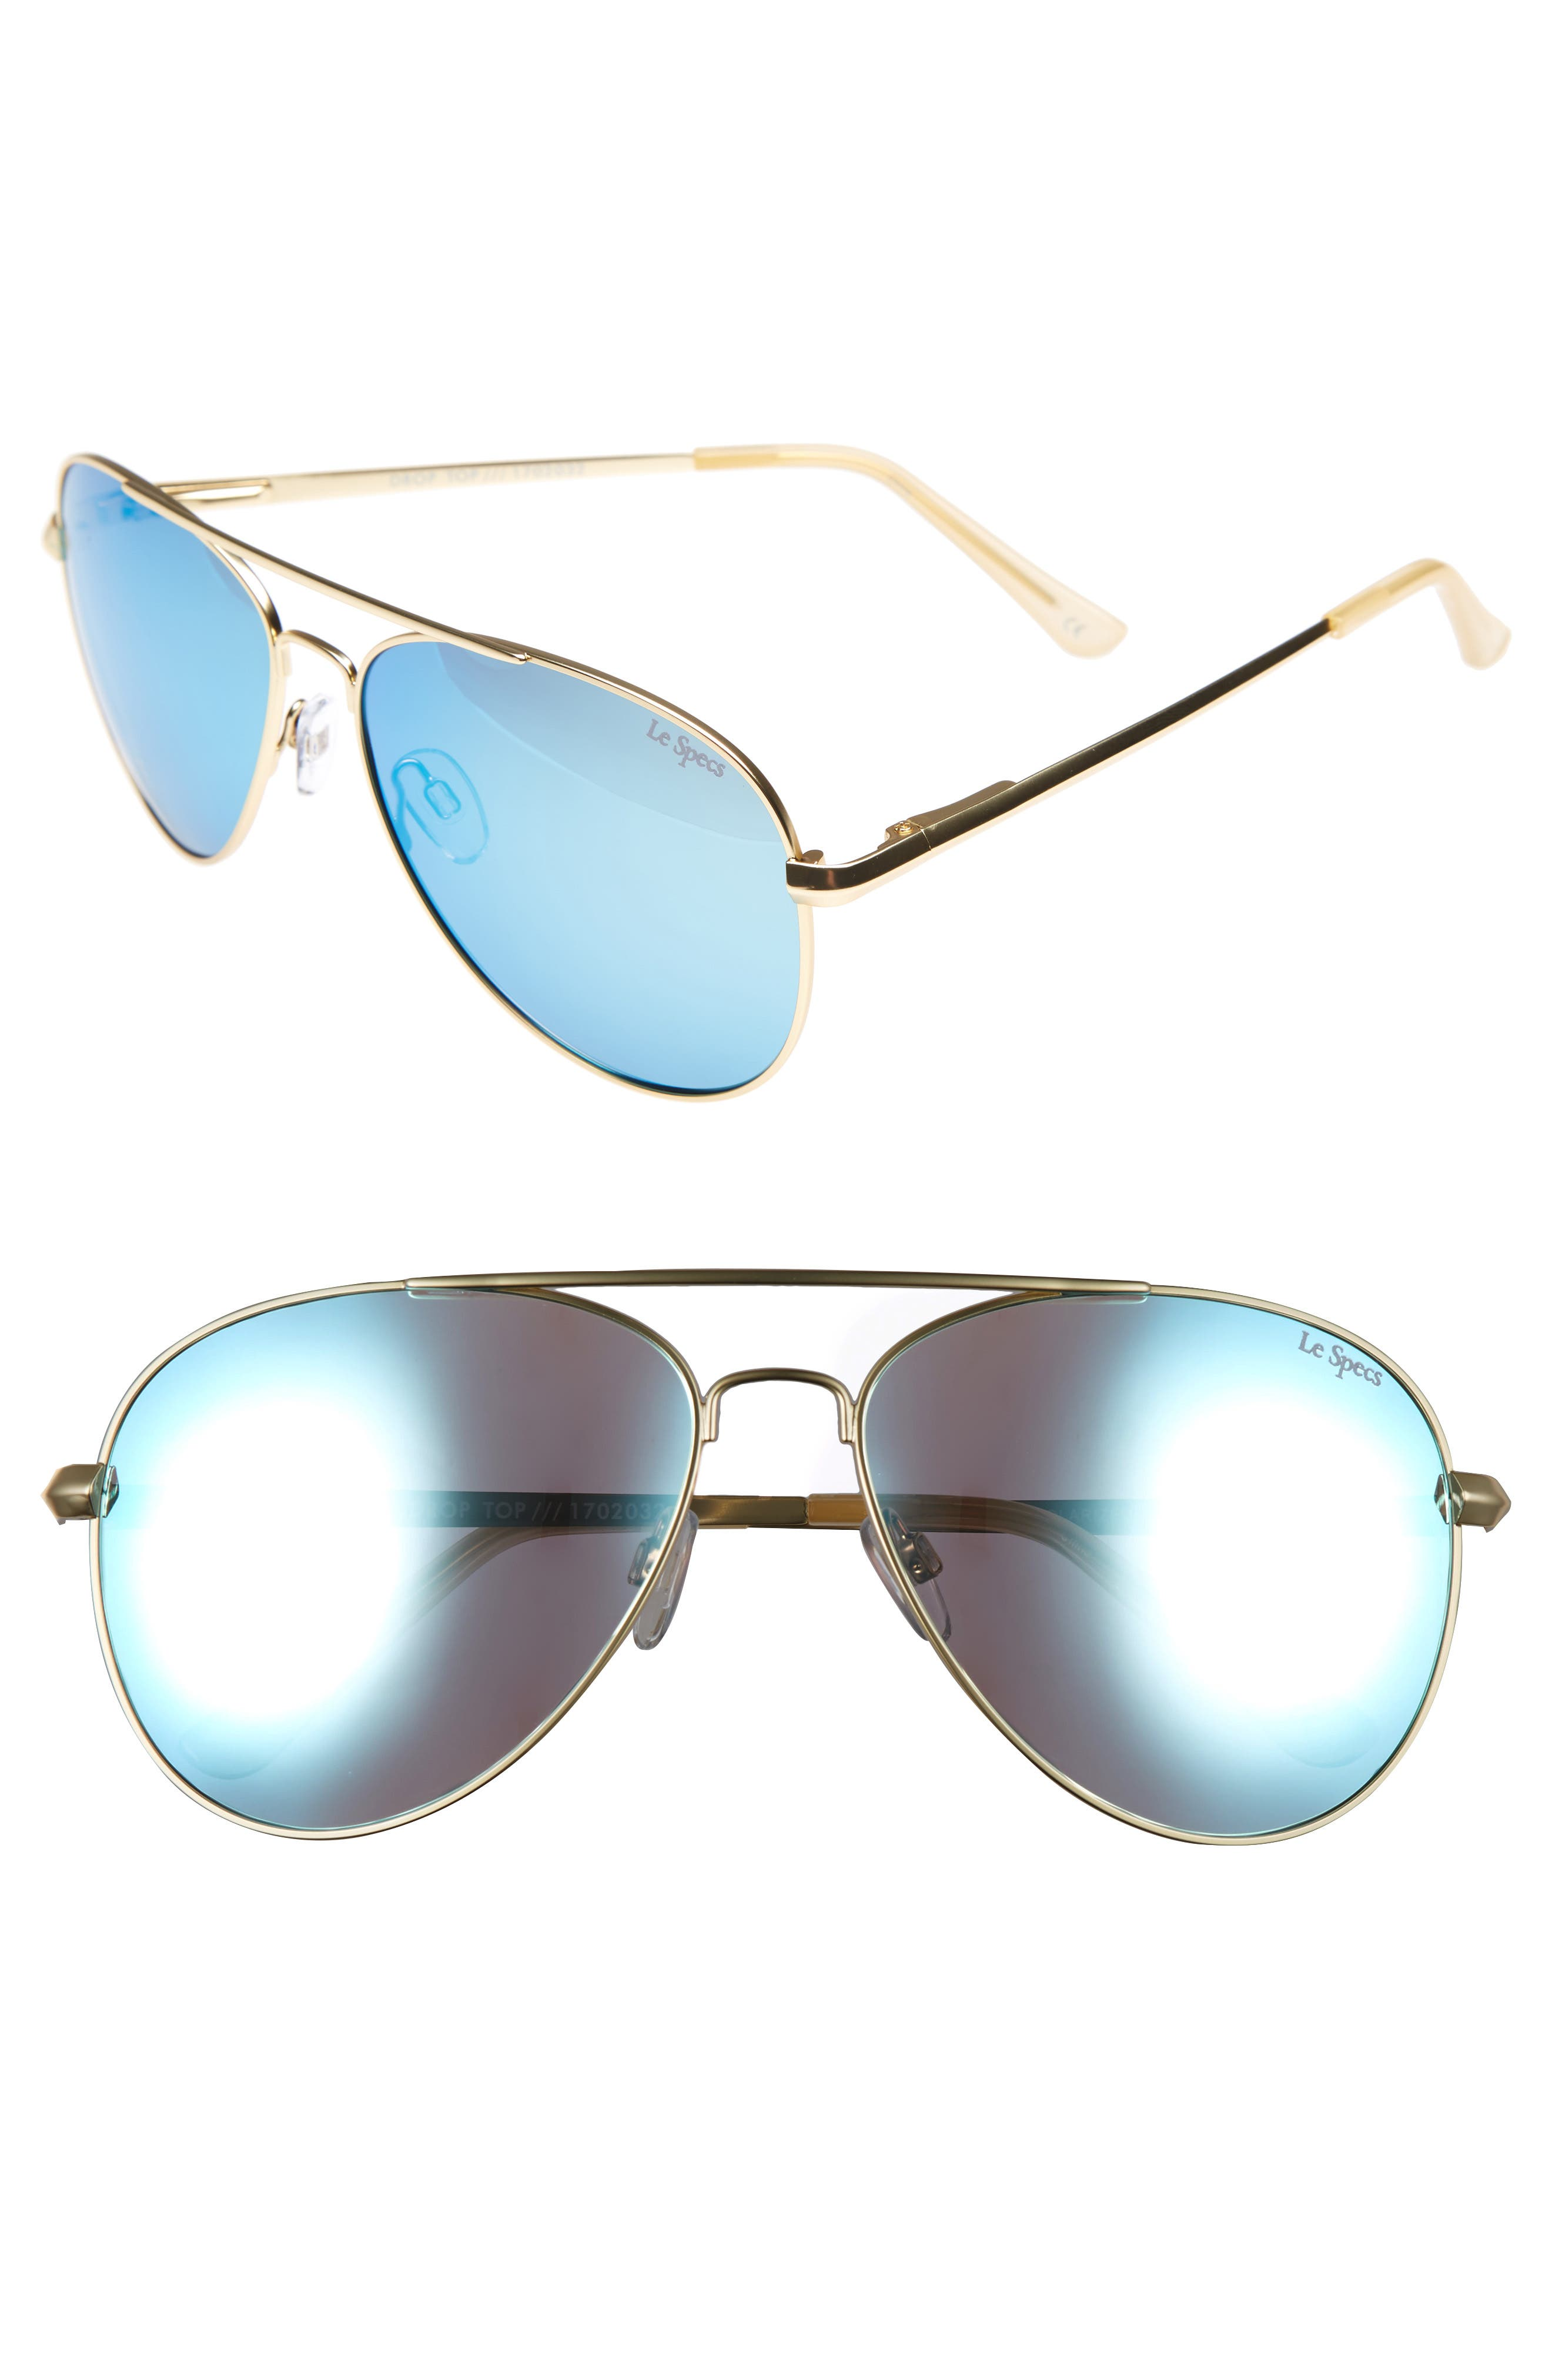 Drop Top 60mm Polarized Aviator Sunglasses,                             Alternate thumbnail 2, color,                             710